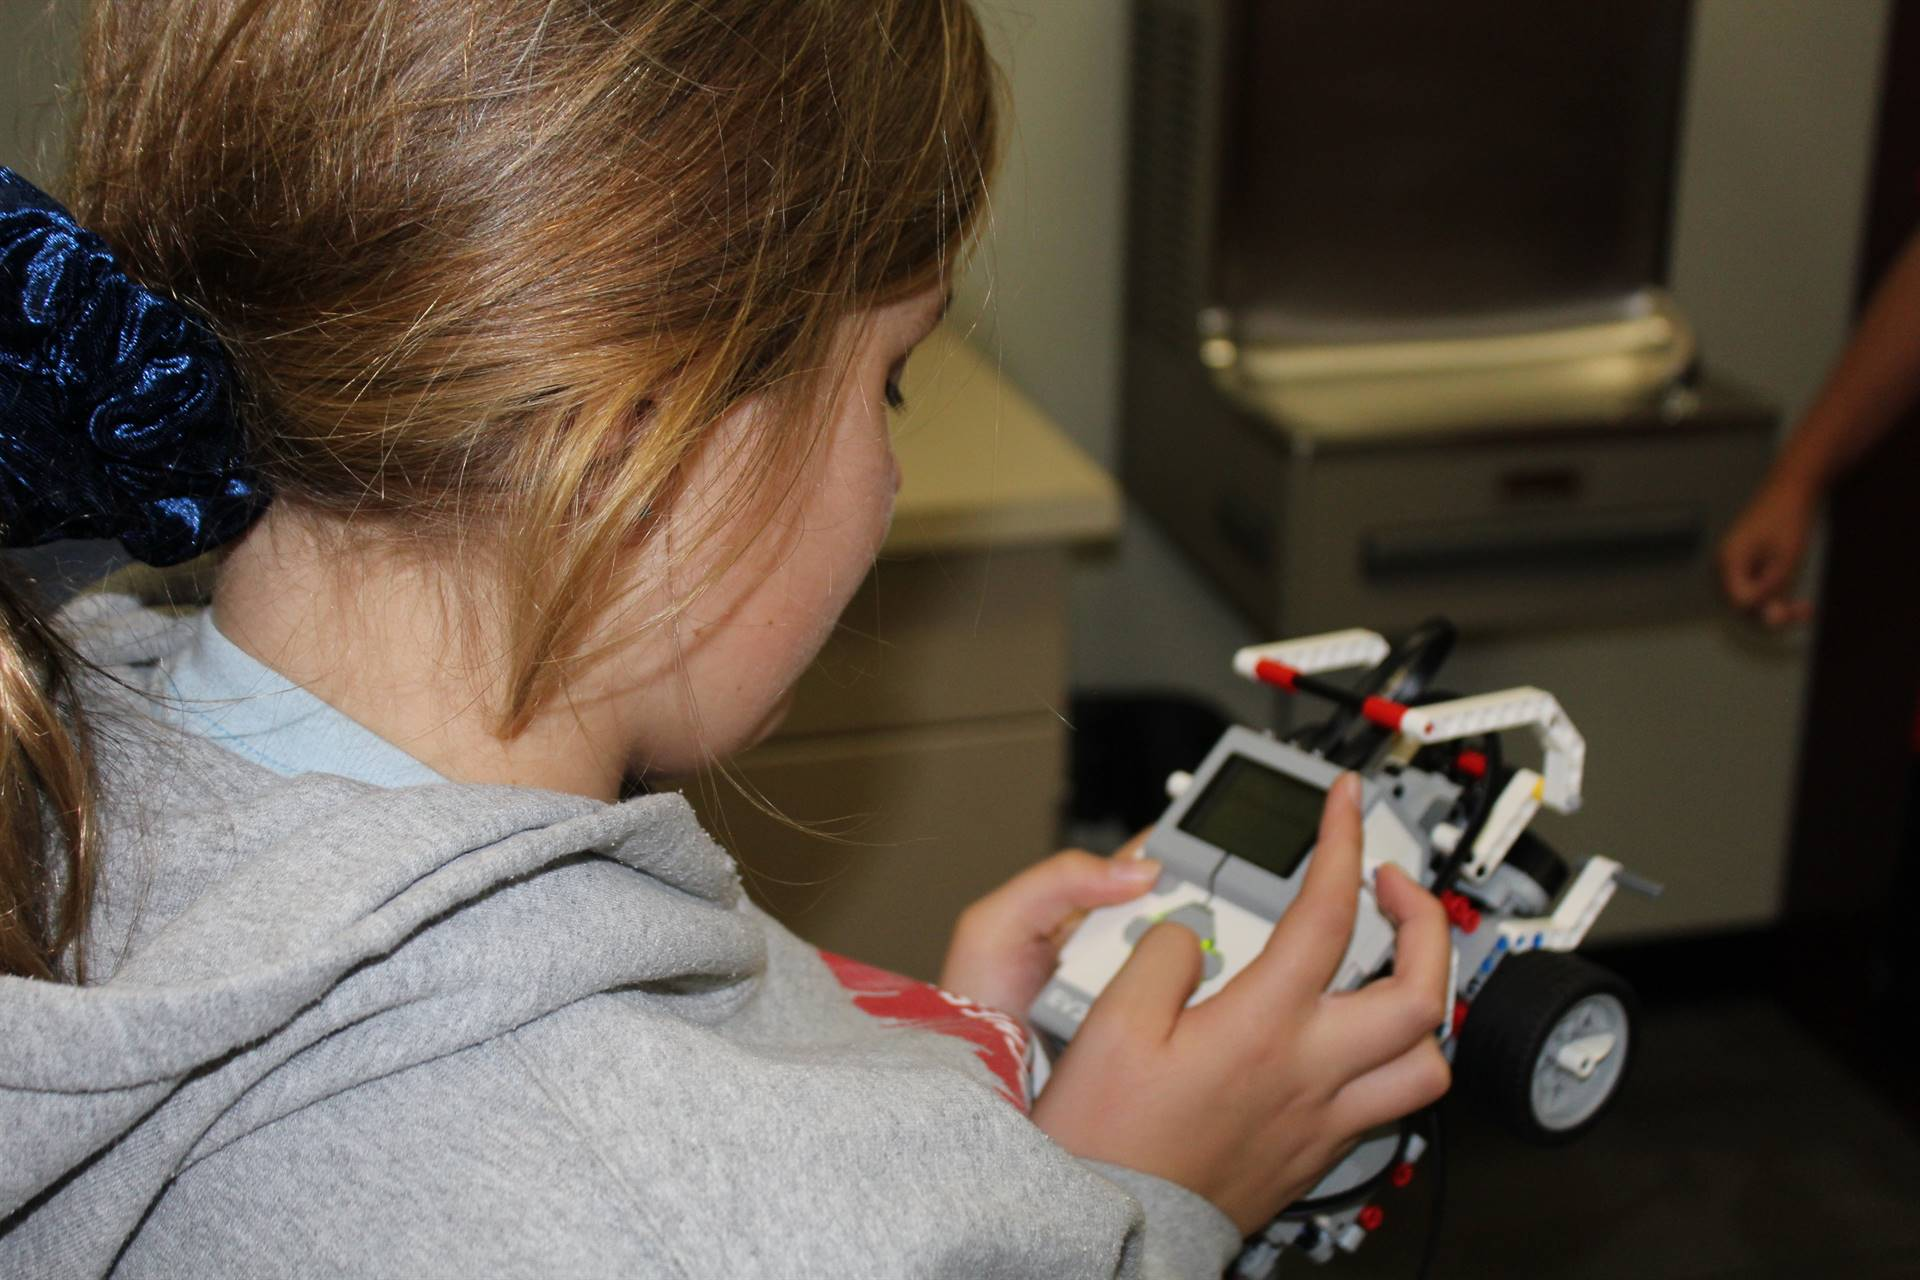 Student programming the robot